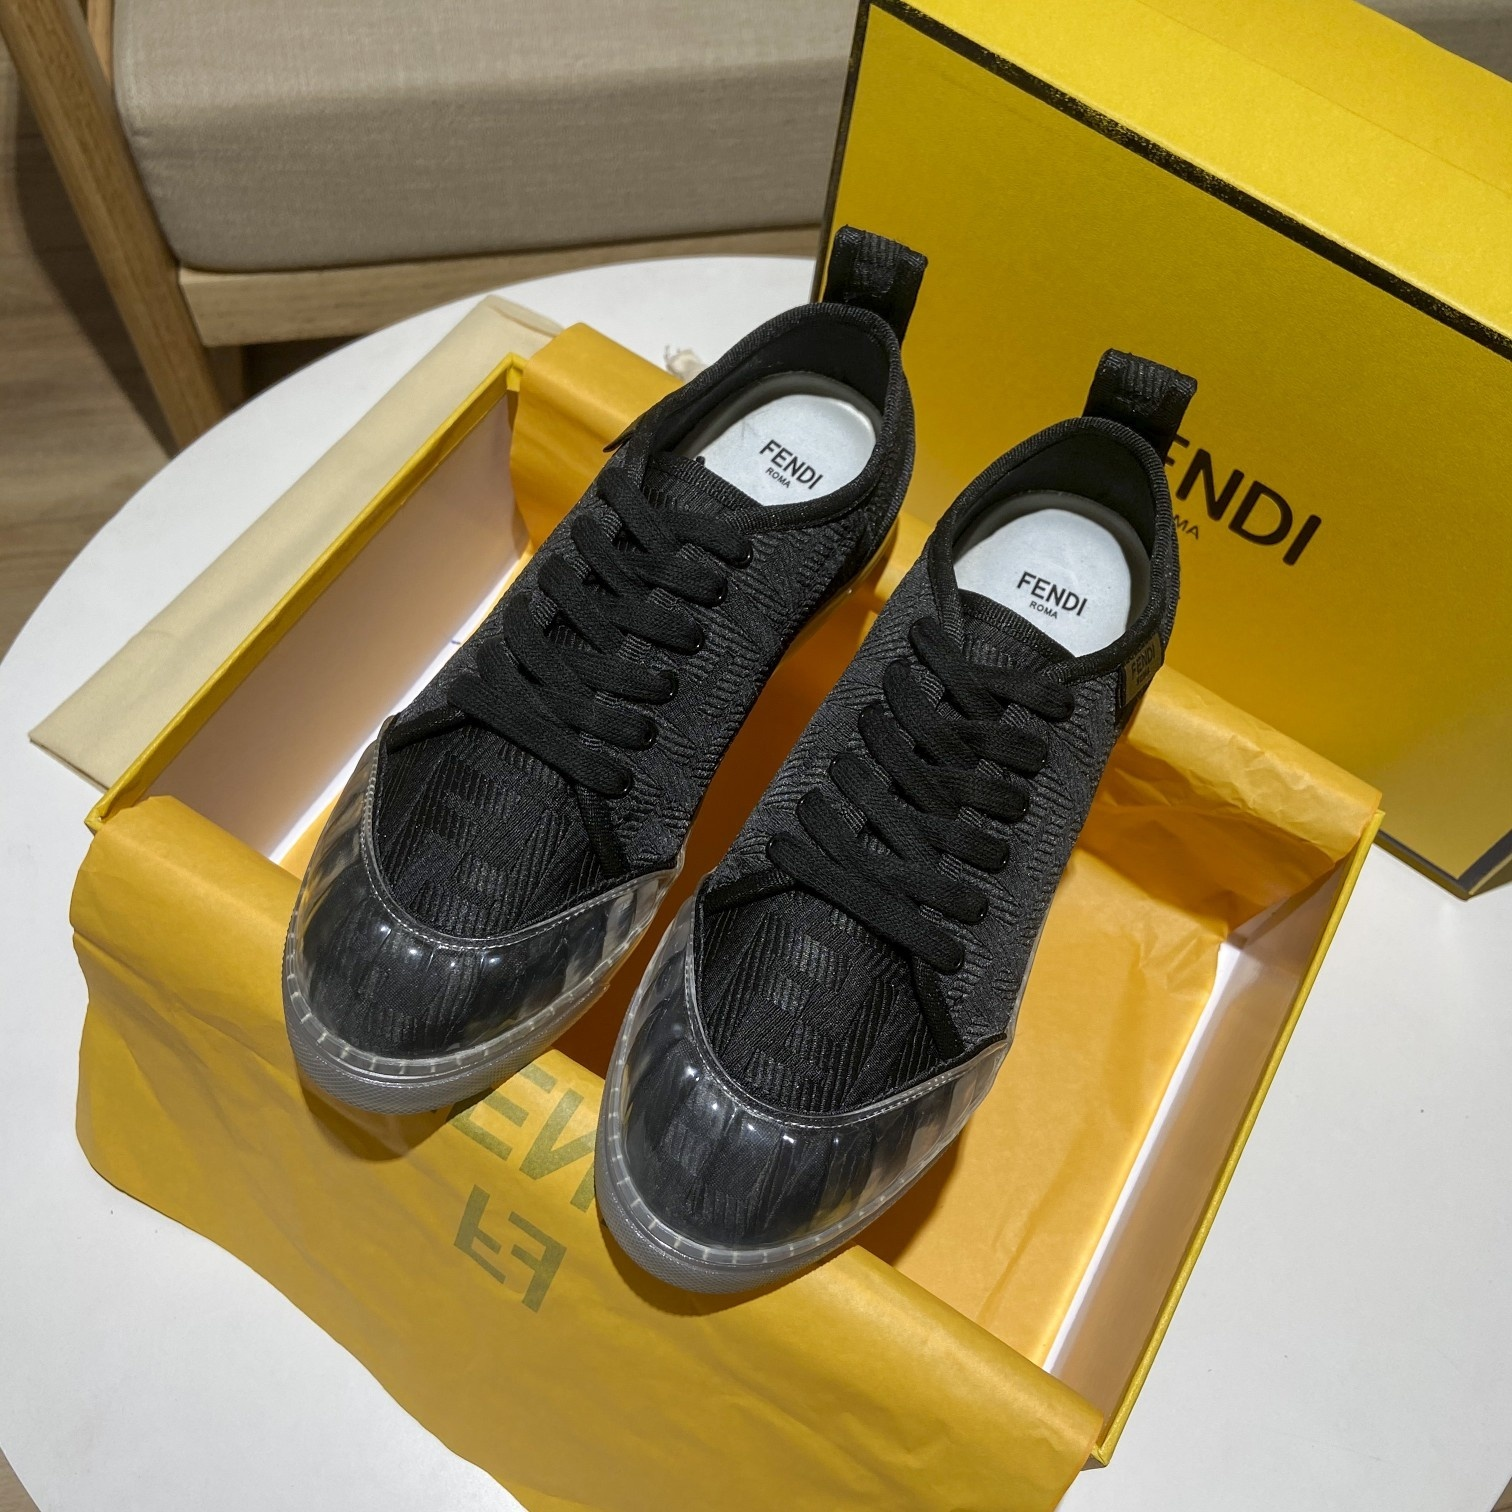 Fendi 芬迪20ss 原版新款电绣提花单鞋(图6)